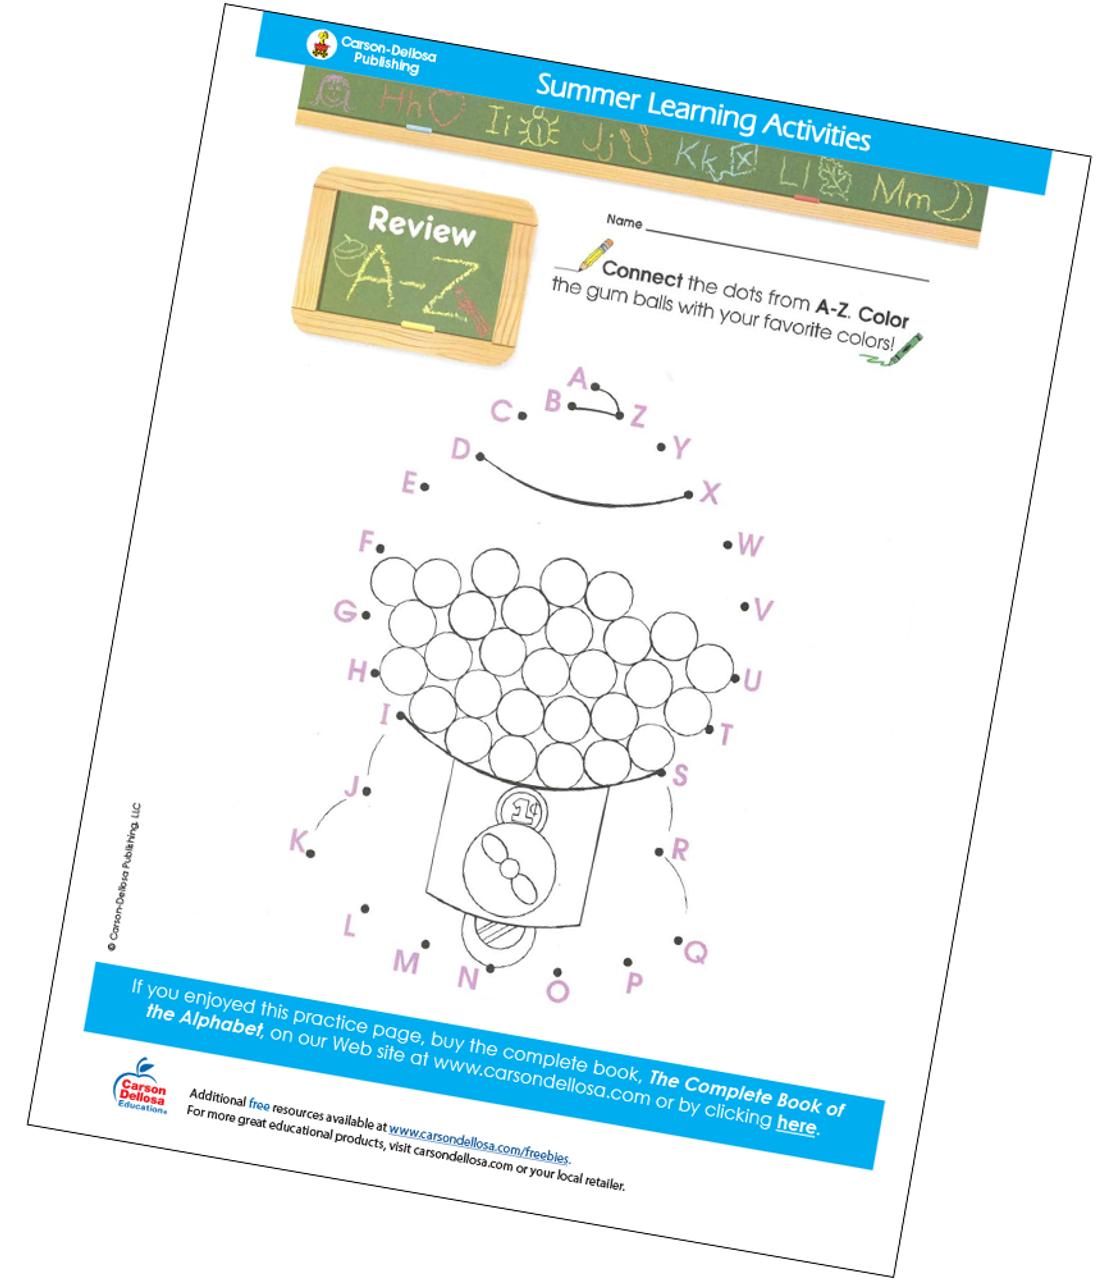 Review A-Z Free Printable | Carson Dellosa